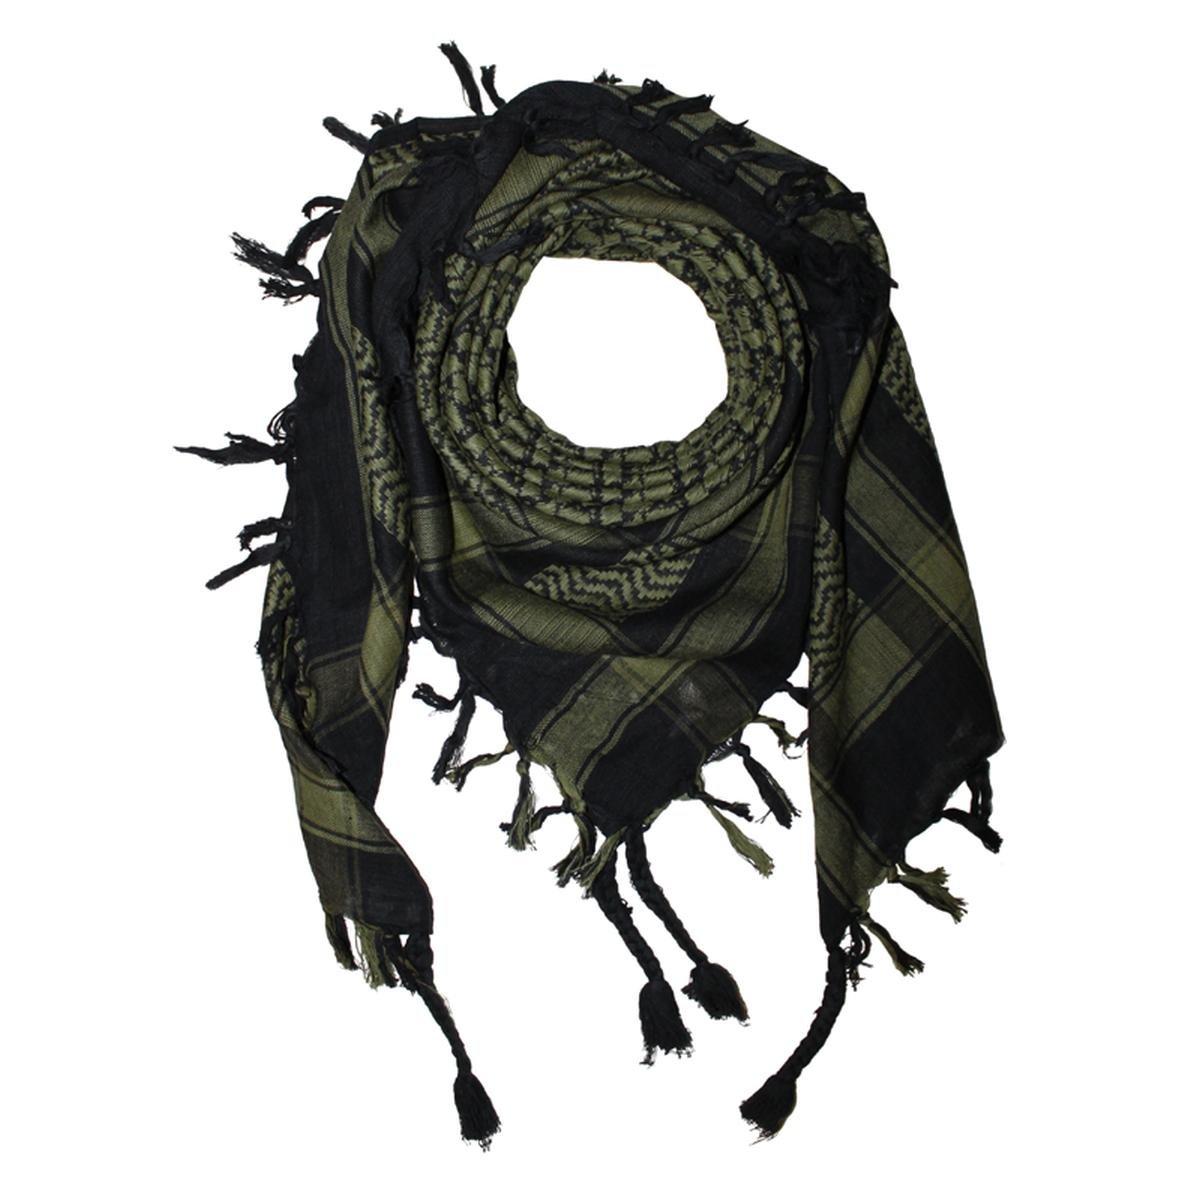 Freak Scene Foulard kefiah palestinese 100% cotone con fondo nero 100x100 cm – nero/verde-oliva